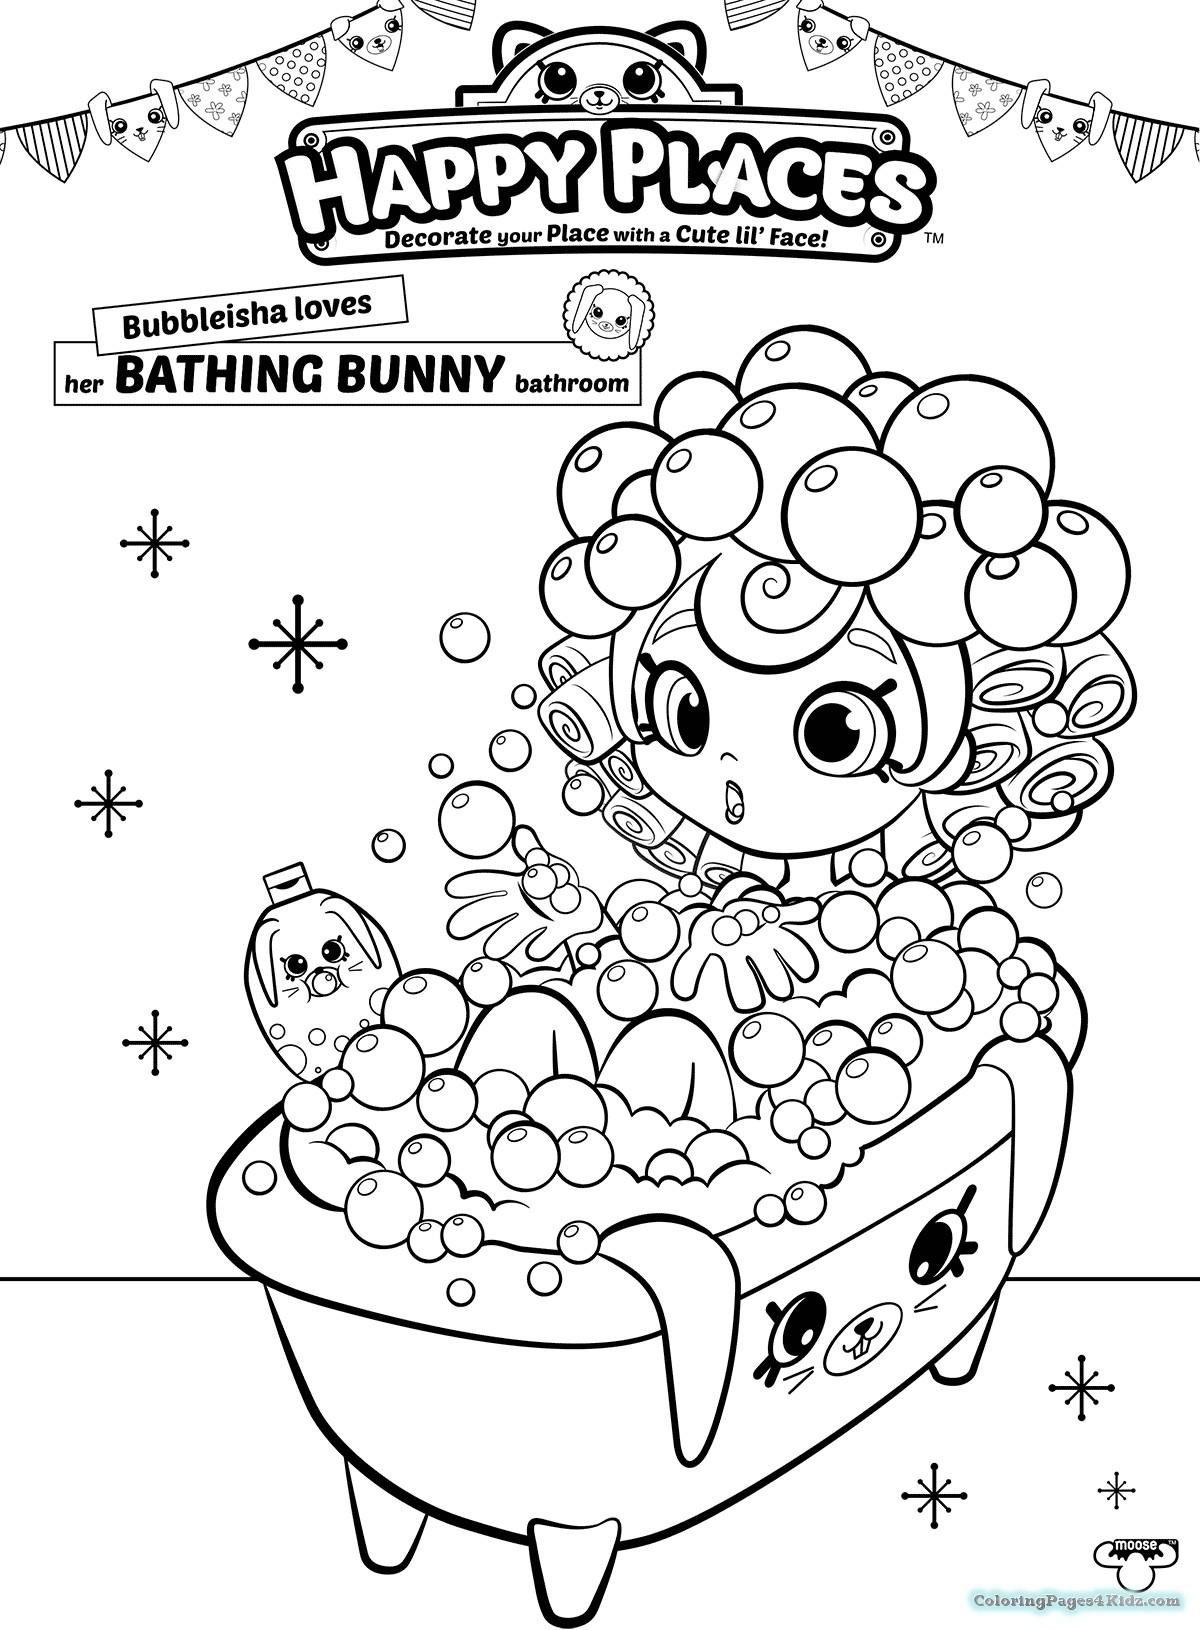 Bathroom Coloring Pages At Getdrawings